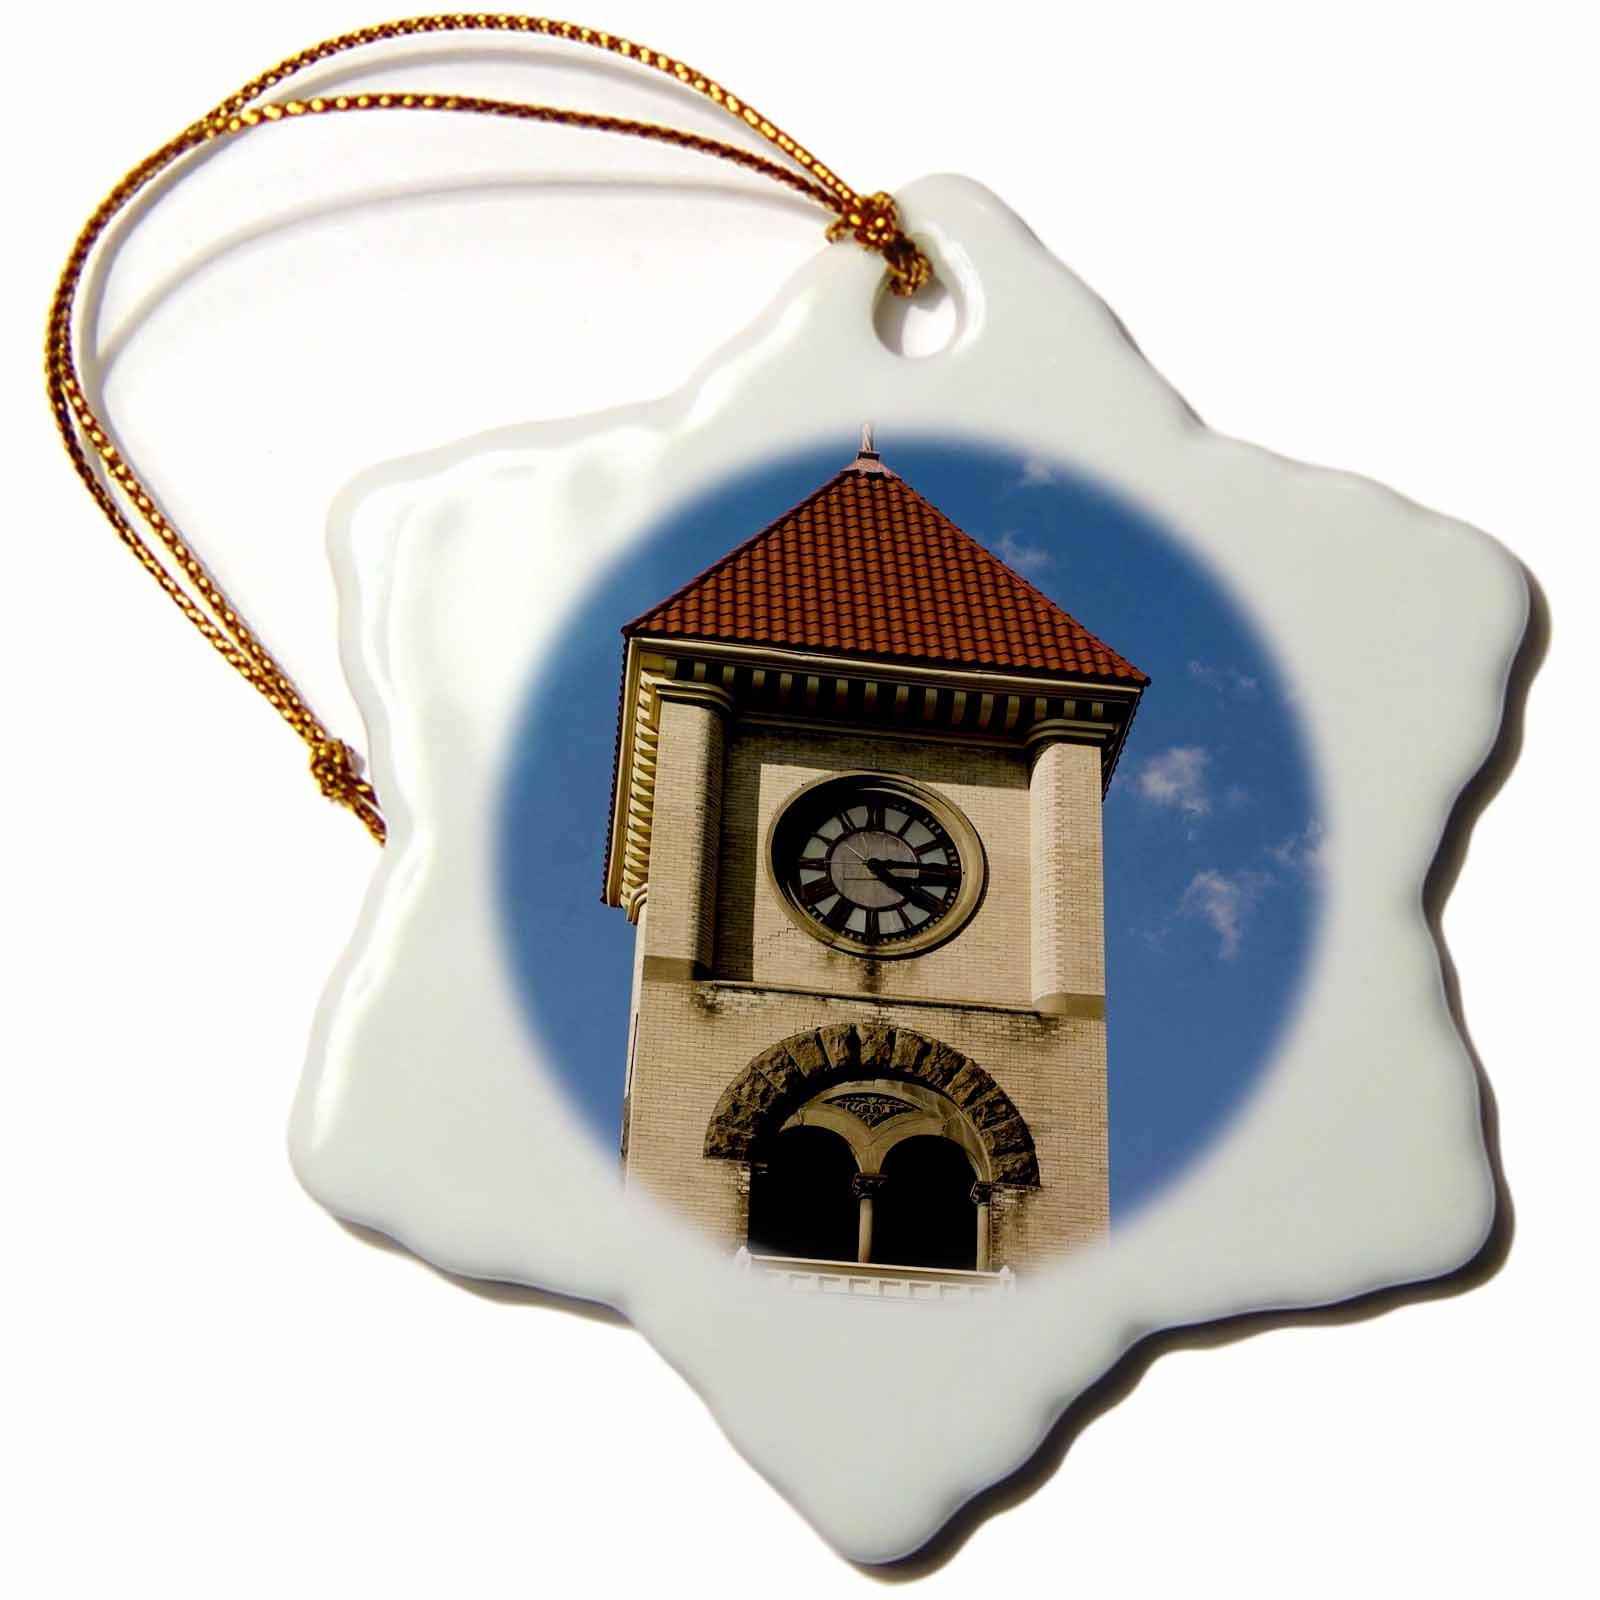 3dRose orn_148413_1 Whitman College, Walla Walla, Washington State, Usa-Us48 Nwh0004-Nik Wheeler-Snowflake Ornament, 3-Inch, Porcelain